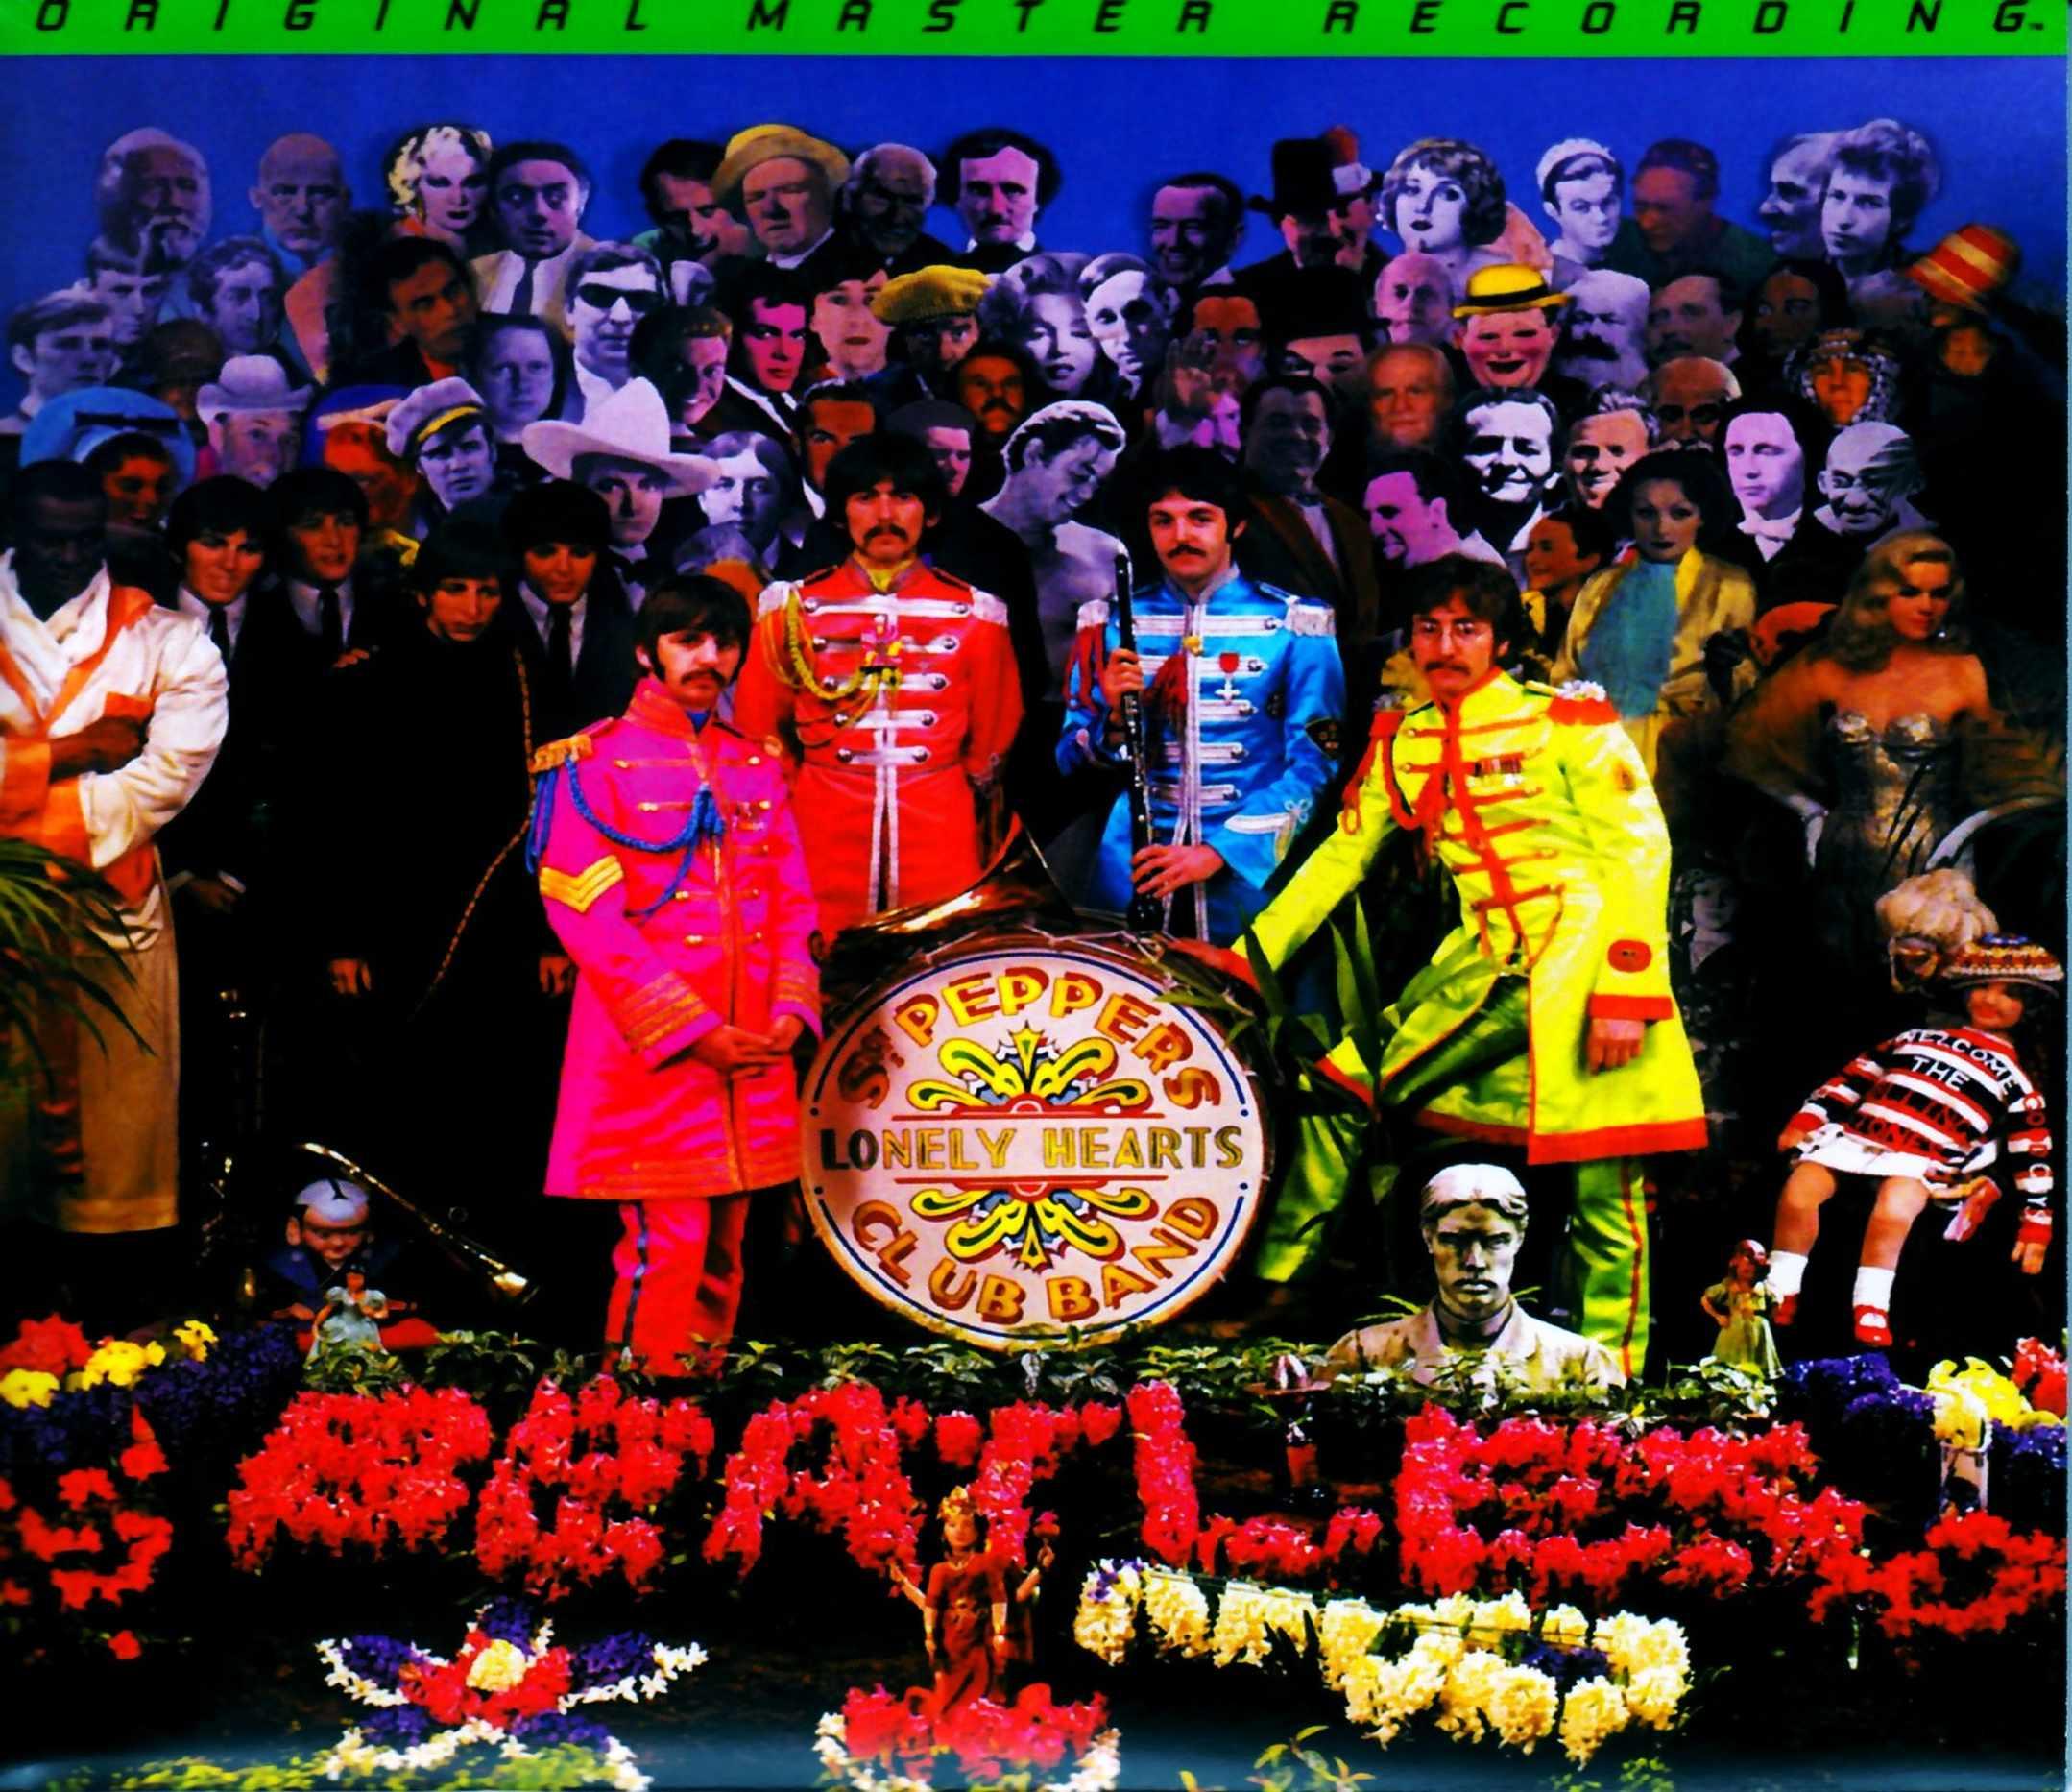 Beatles ビートルズ/サージェント・ペパーズ・ロンリー・ハーツ・クラブ・バンド Sgt Pepper's Lonely Hearts Club Band UHQR